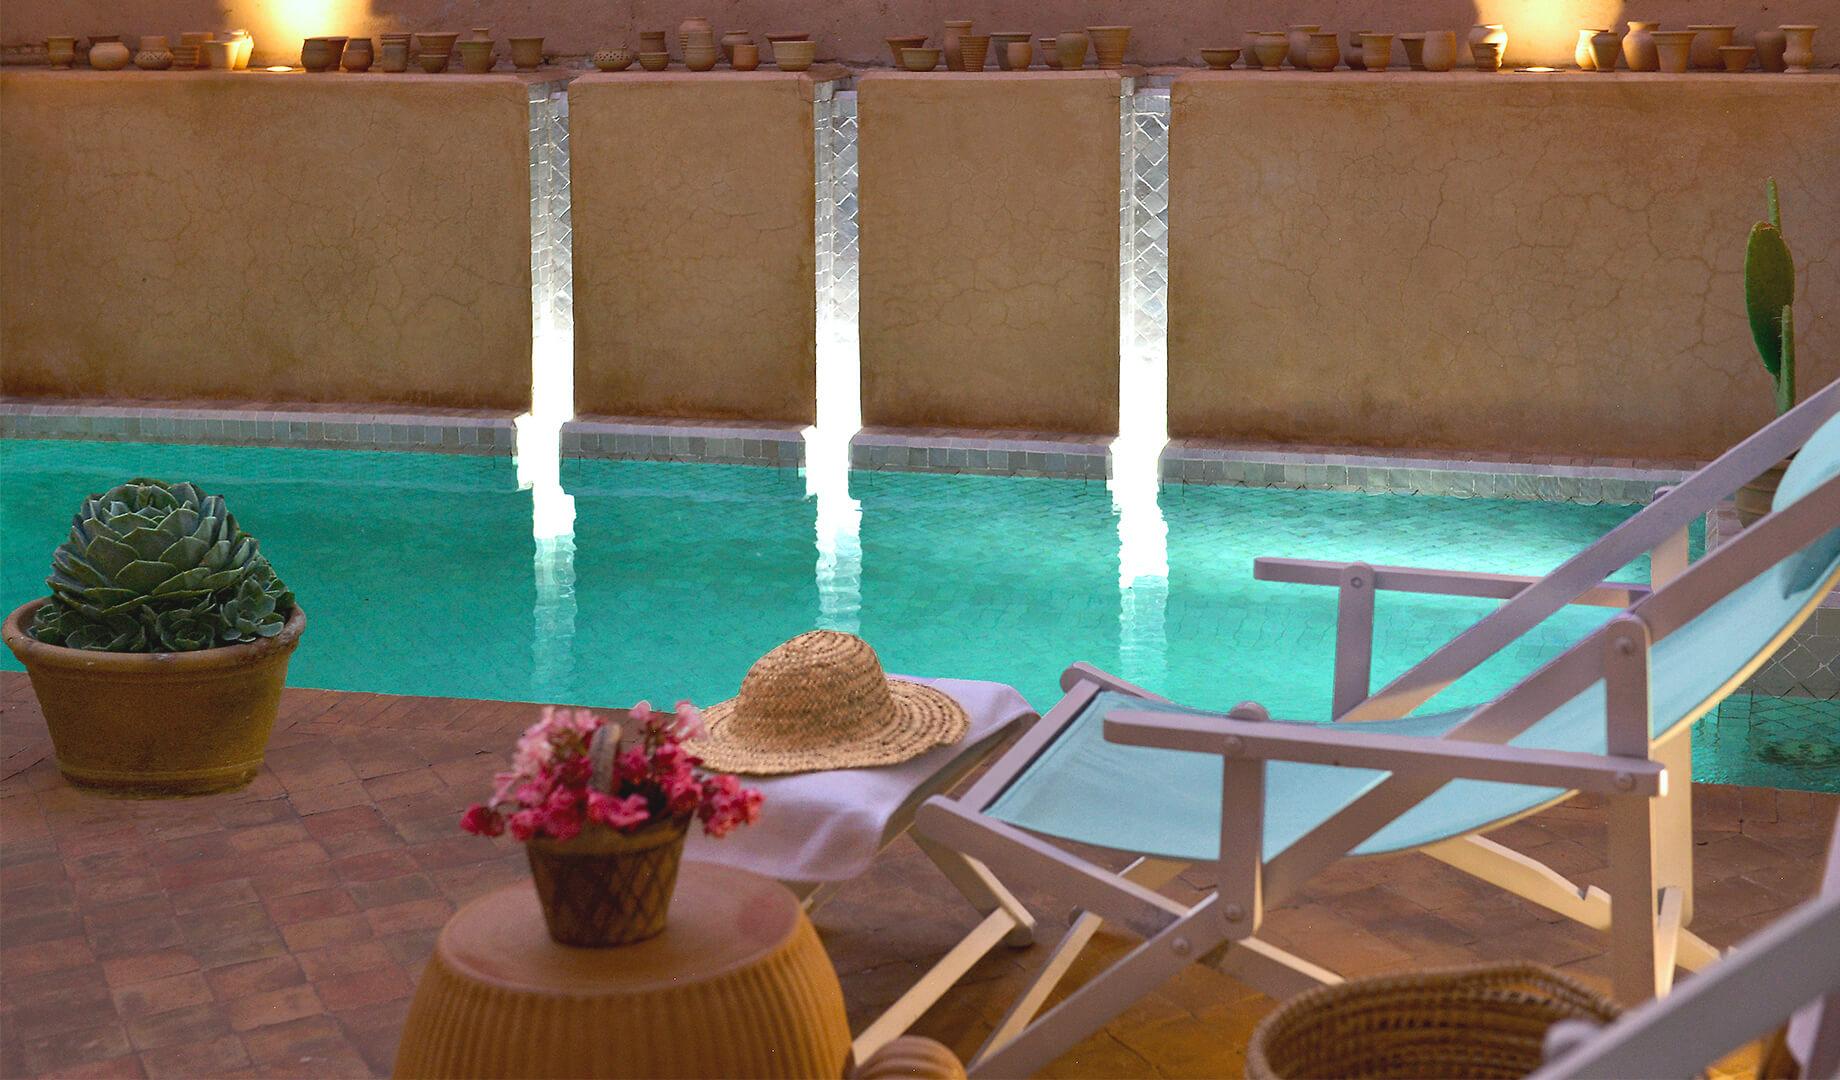 swimming pool of the riad Dar Housnia in Marrakech